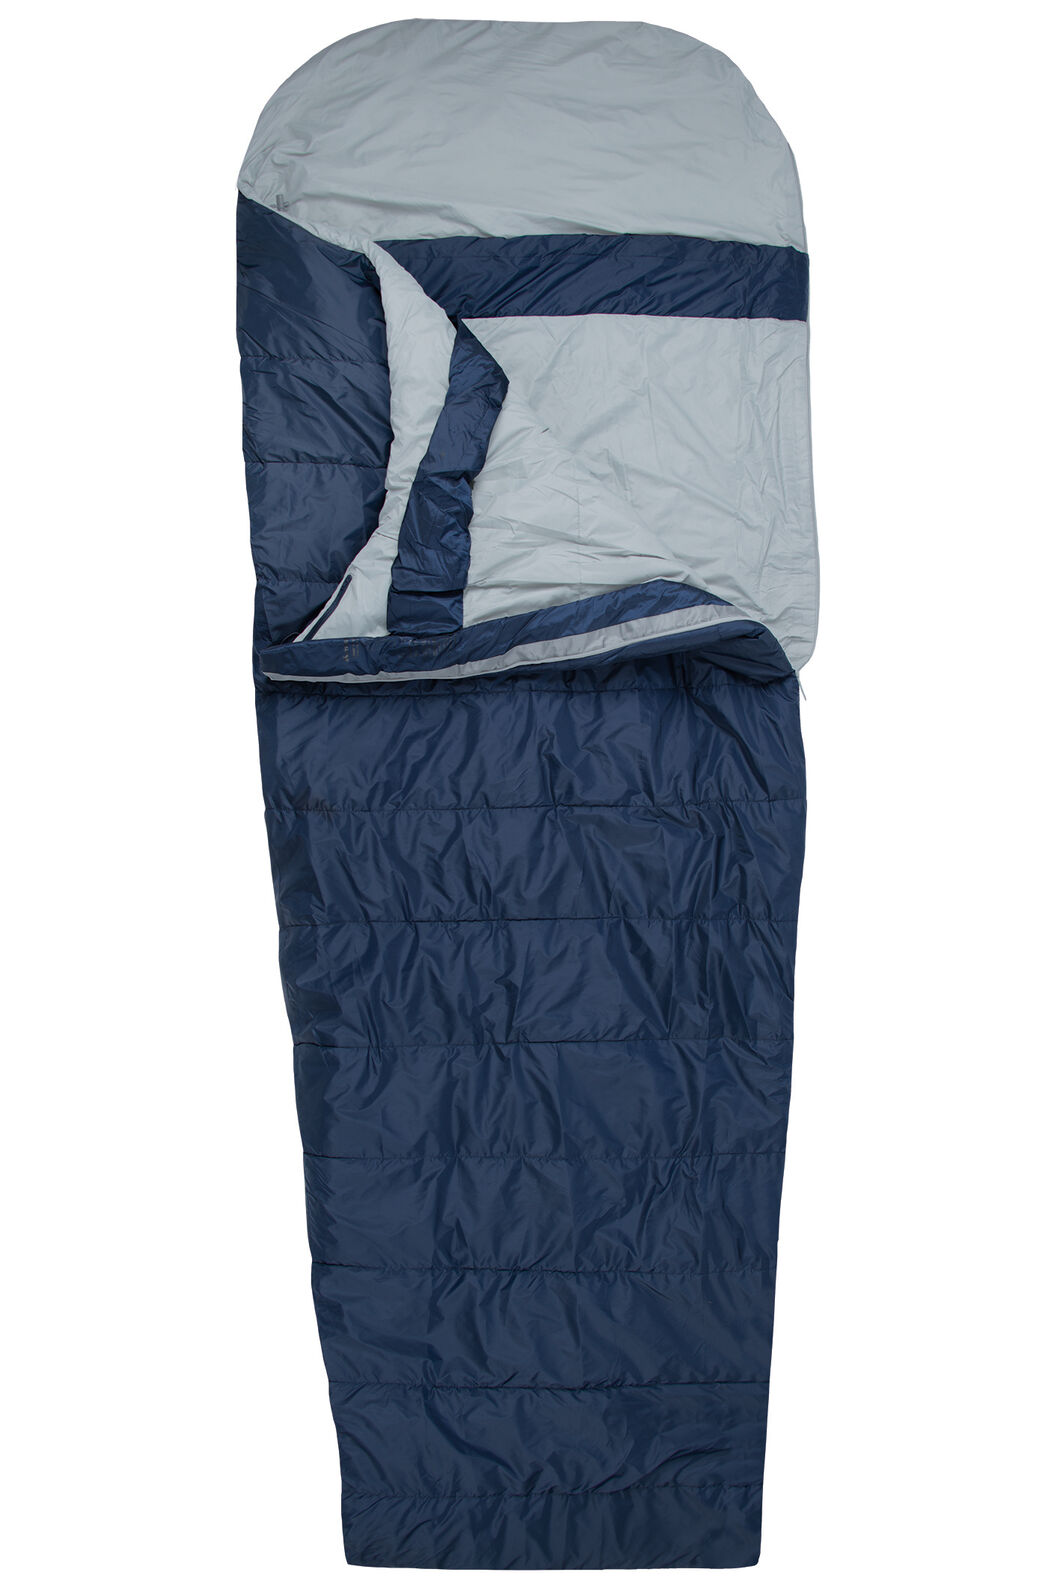 Macpac Roam 150 Extra Large Synthetic Sleeping Bag, Black Iris, hi-res